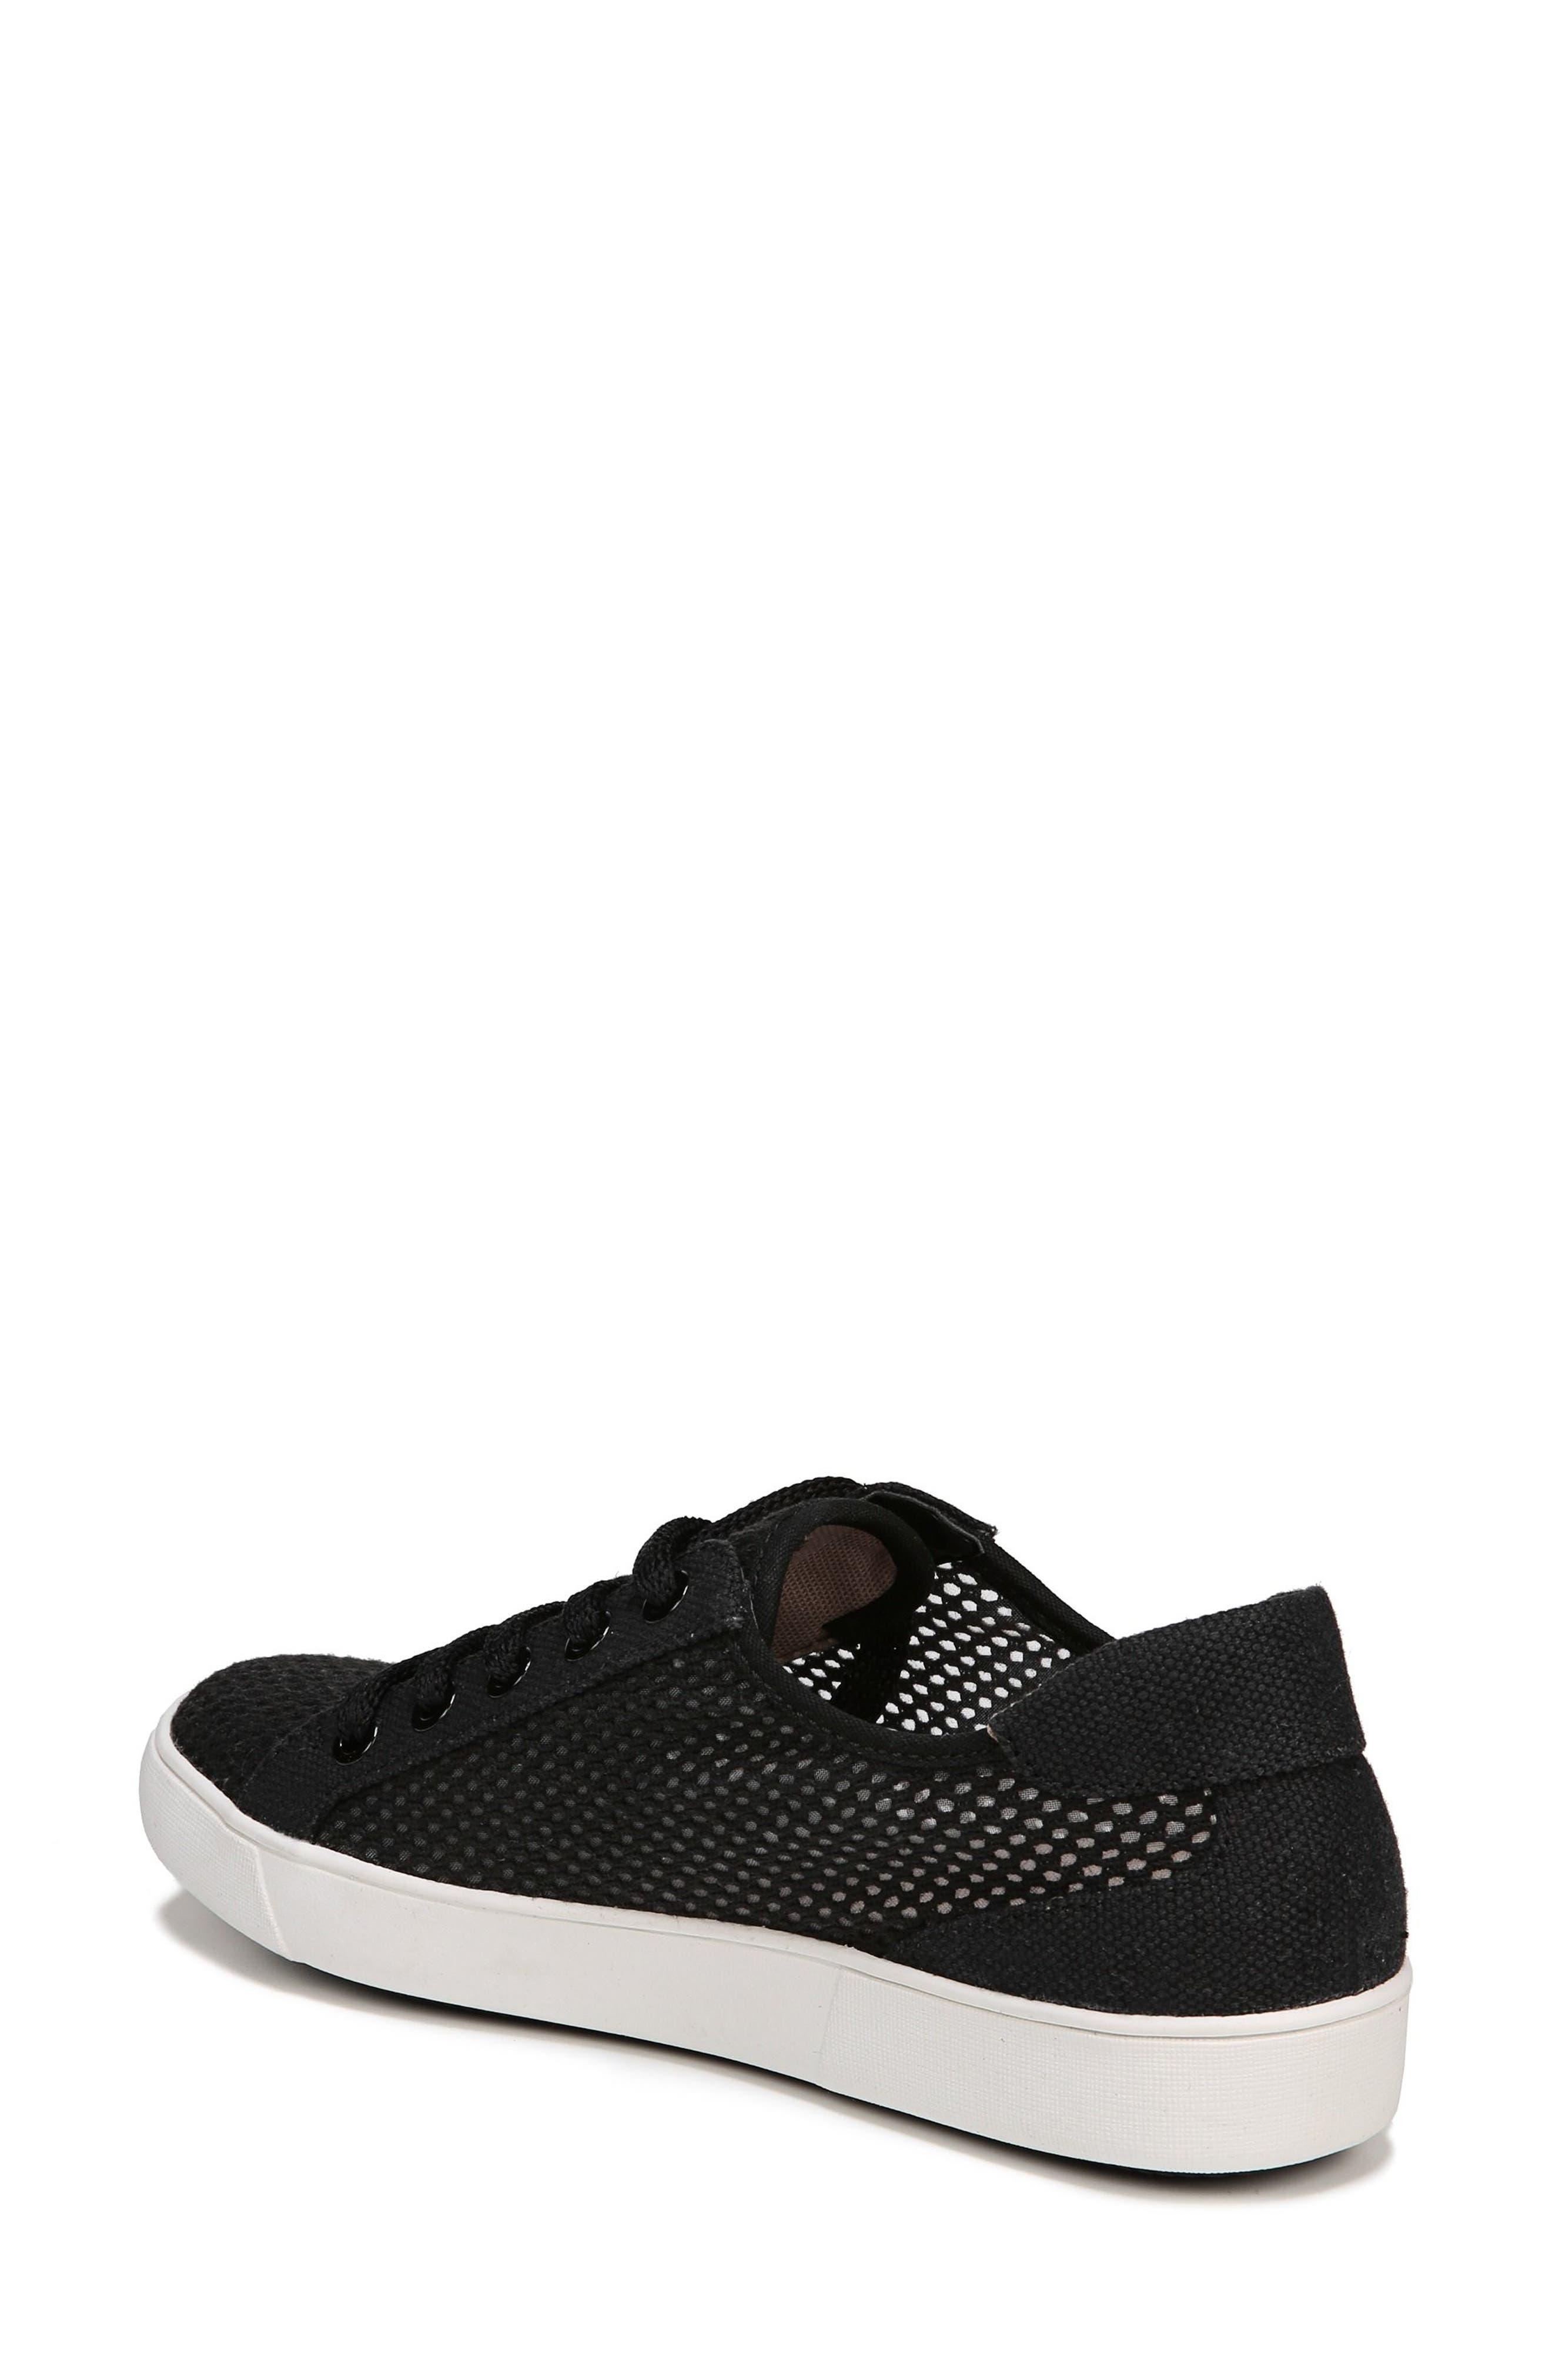 Morrison III Perforated Sneaker,                             Alternate thumbnail 2, color,                             BLACK FABRIC